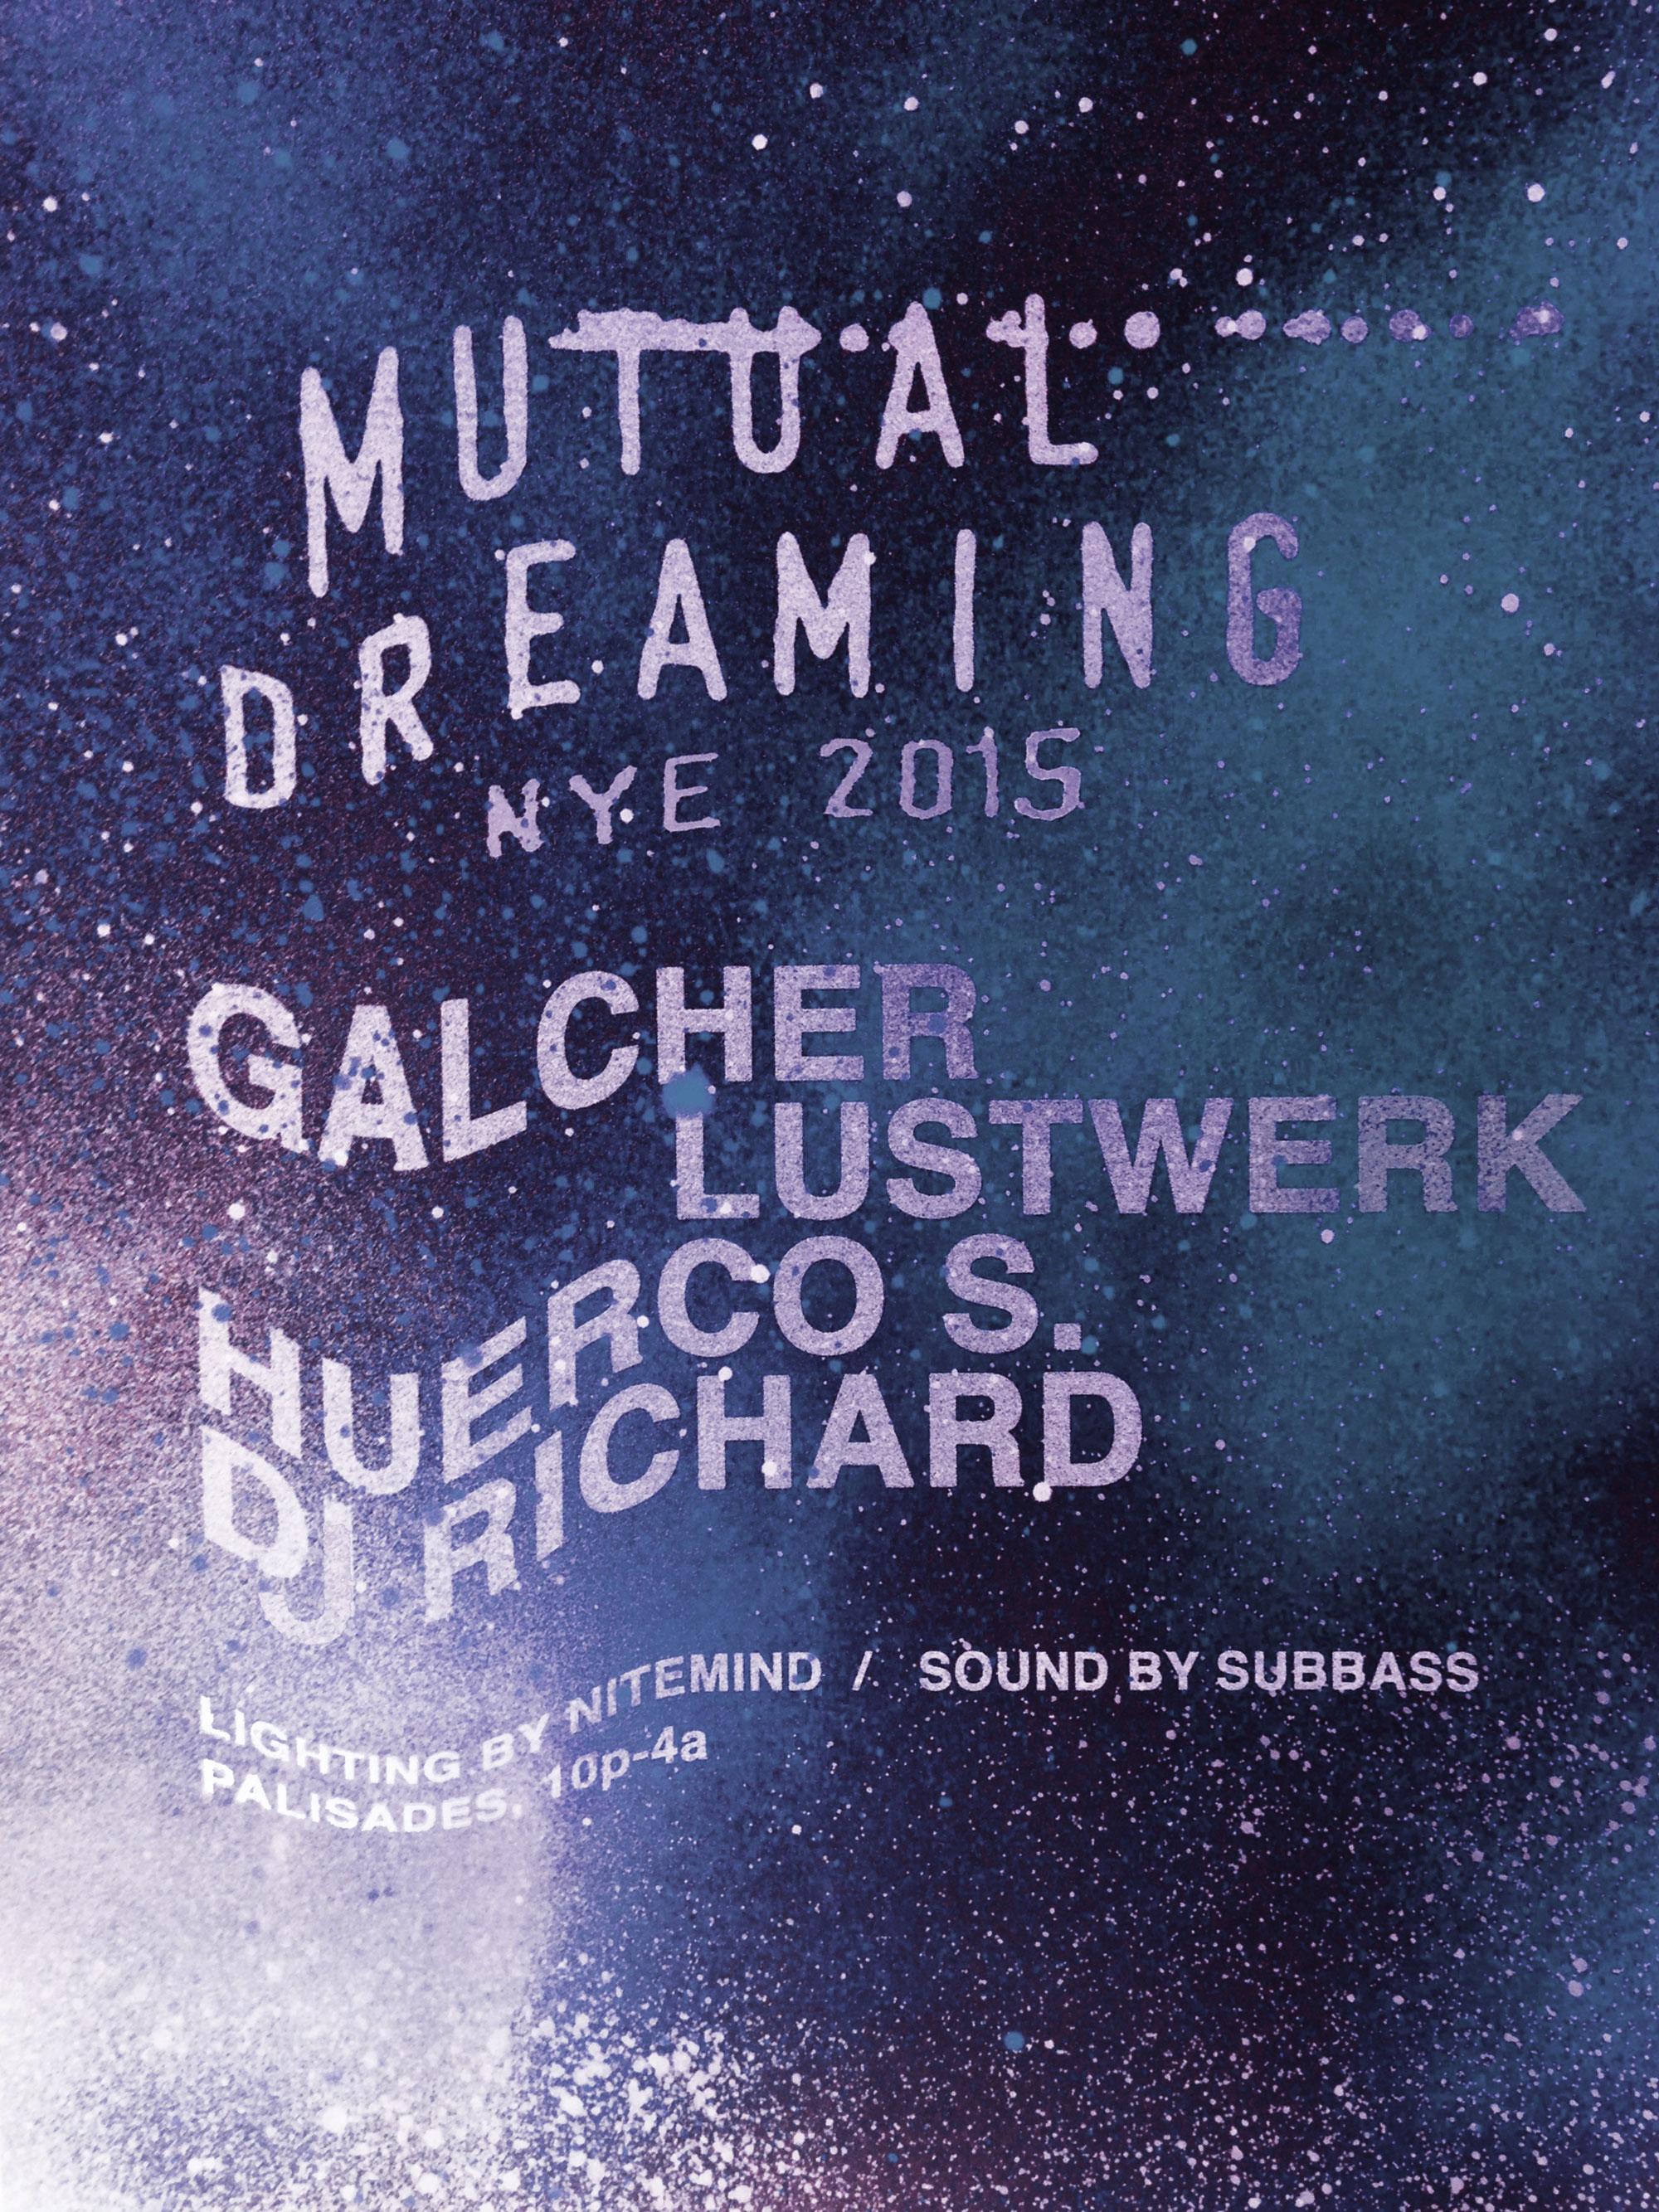 Mutual Dreaming NYE: Galcher Lustwerk, Huerco S., DJ Richard  New Years 2015